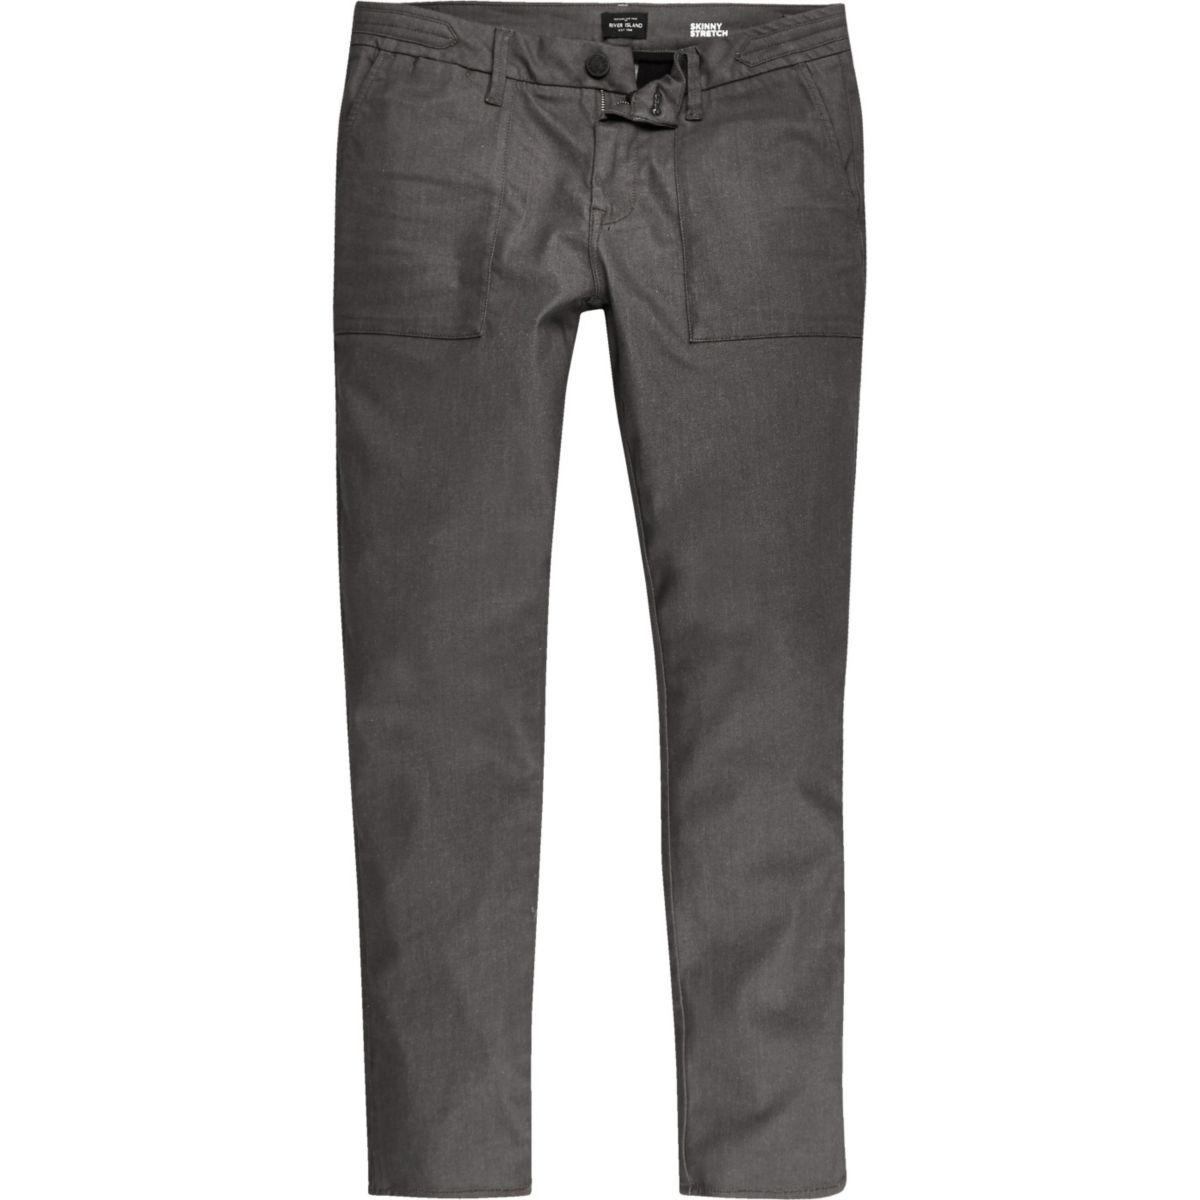 Sid – Skinny Jeans in Braun